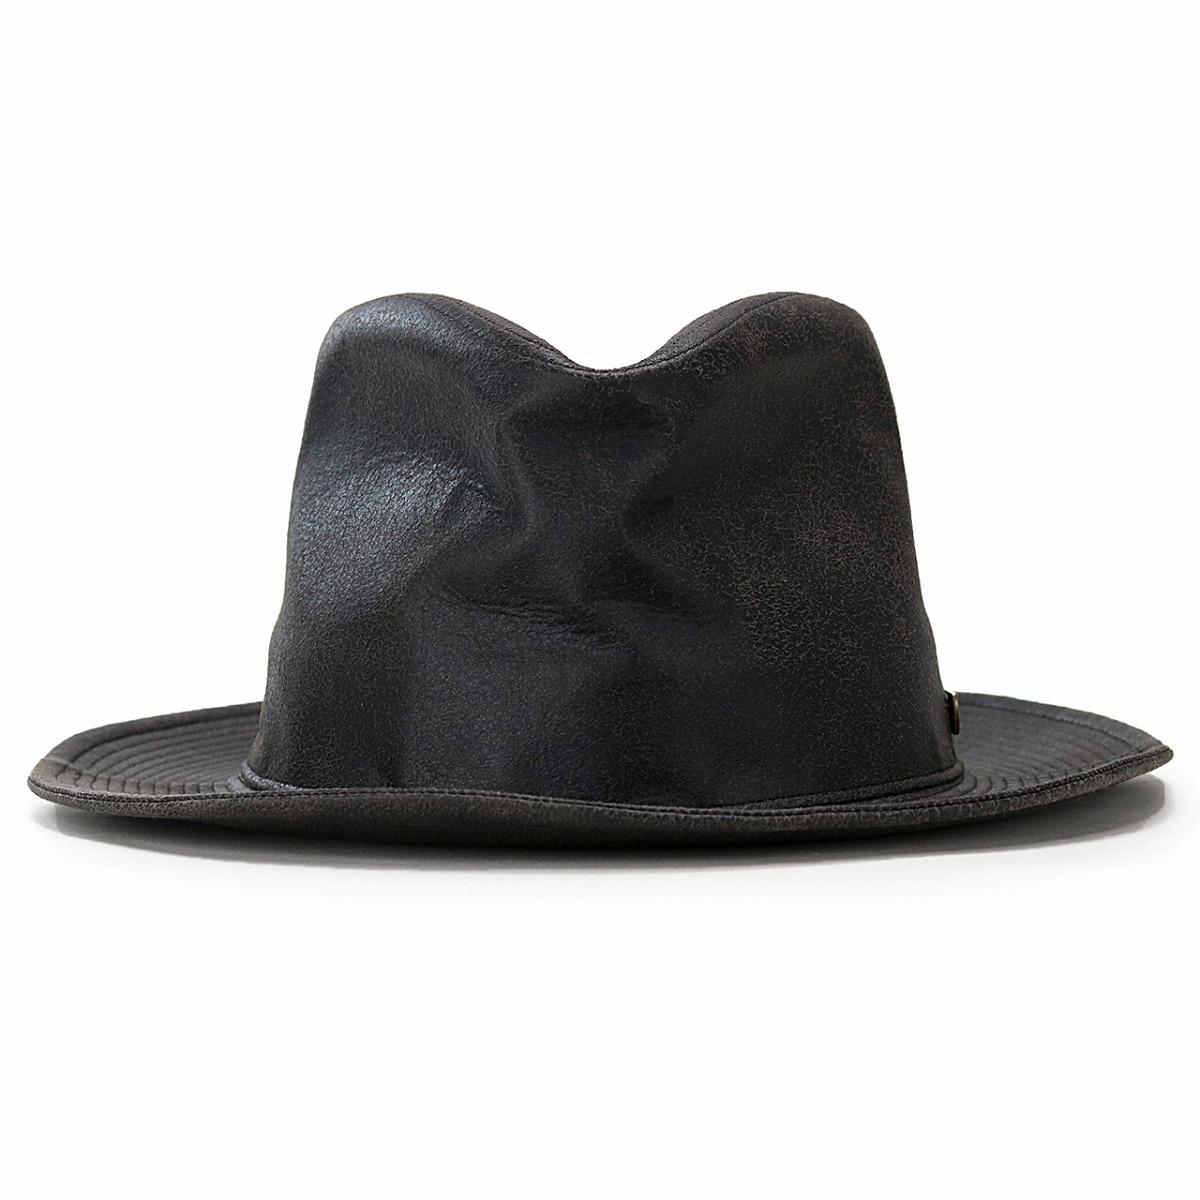 448d8607 ELEHELM HAT STORE: 58cm 60cm STETSON gentleman soft felt hat Shin ...